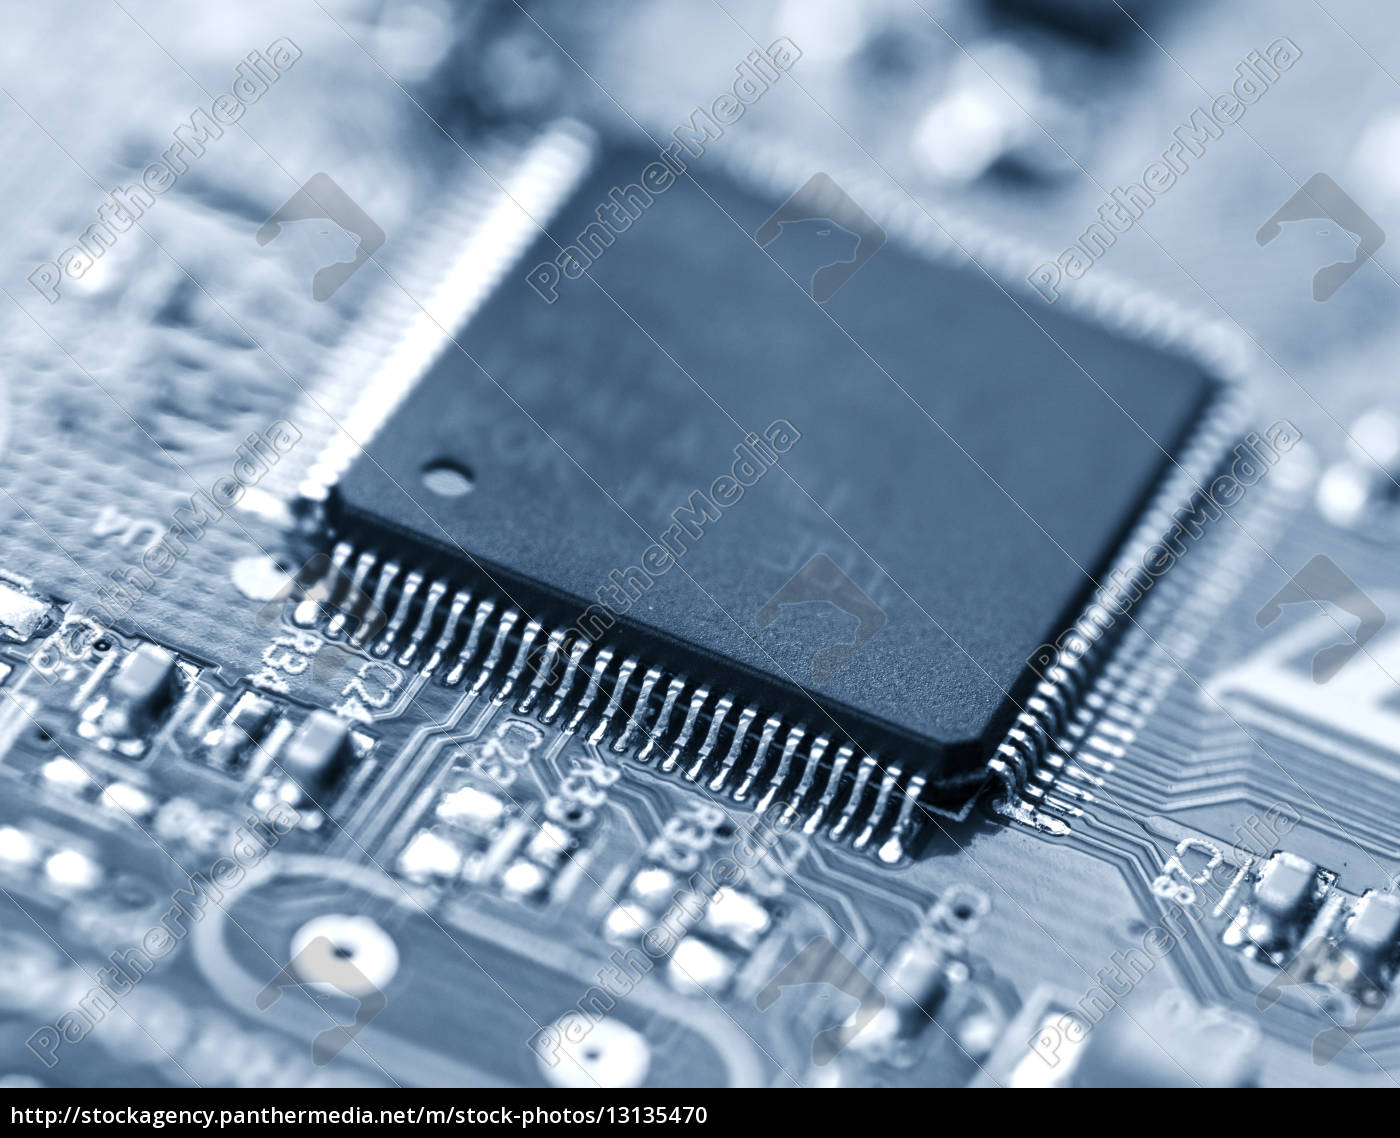 mikroprozessor - 13135470